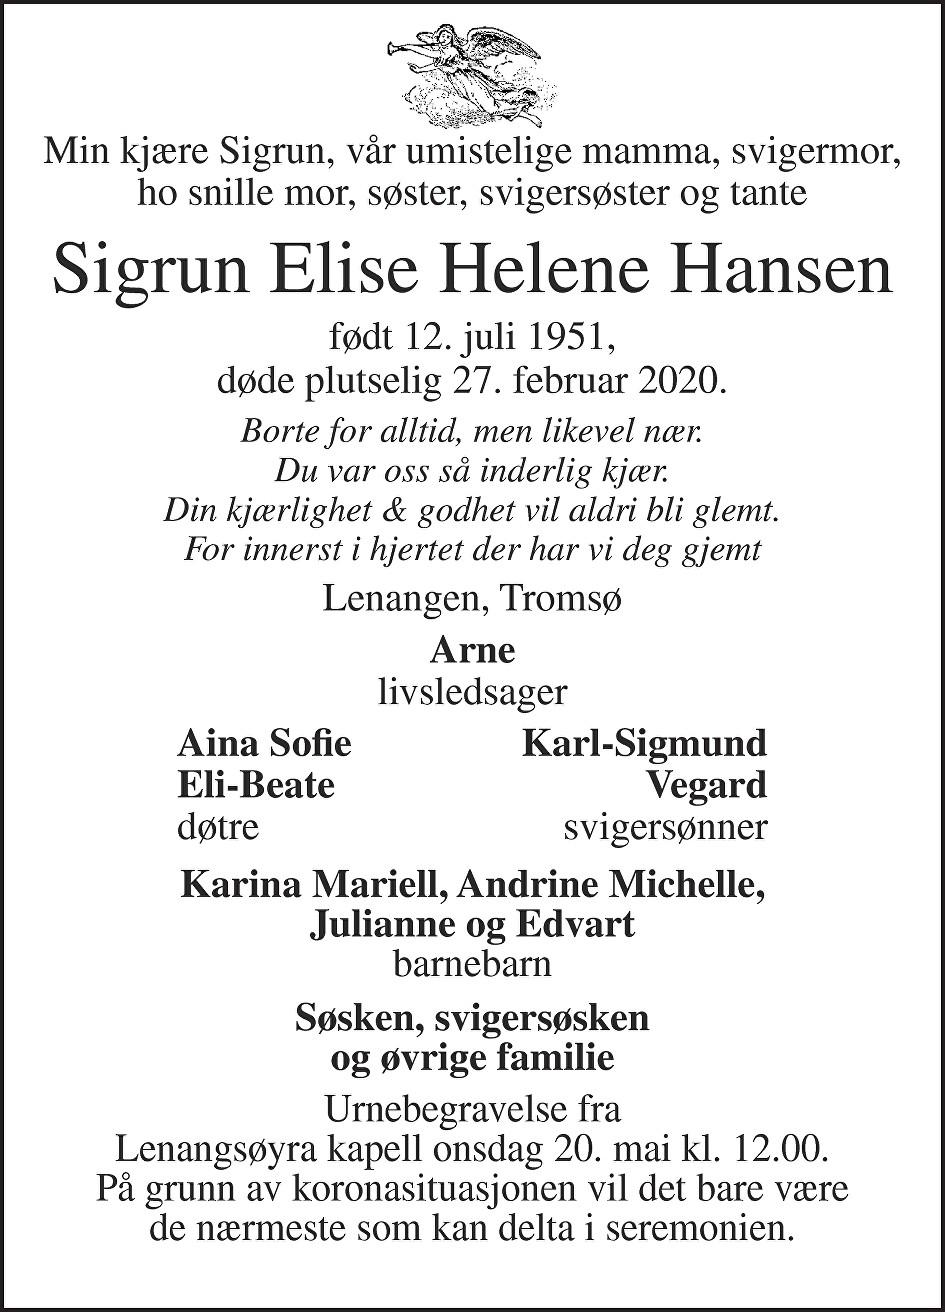 Sigrun Elise Helene Hansen Dødsannonse